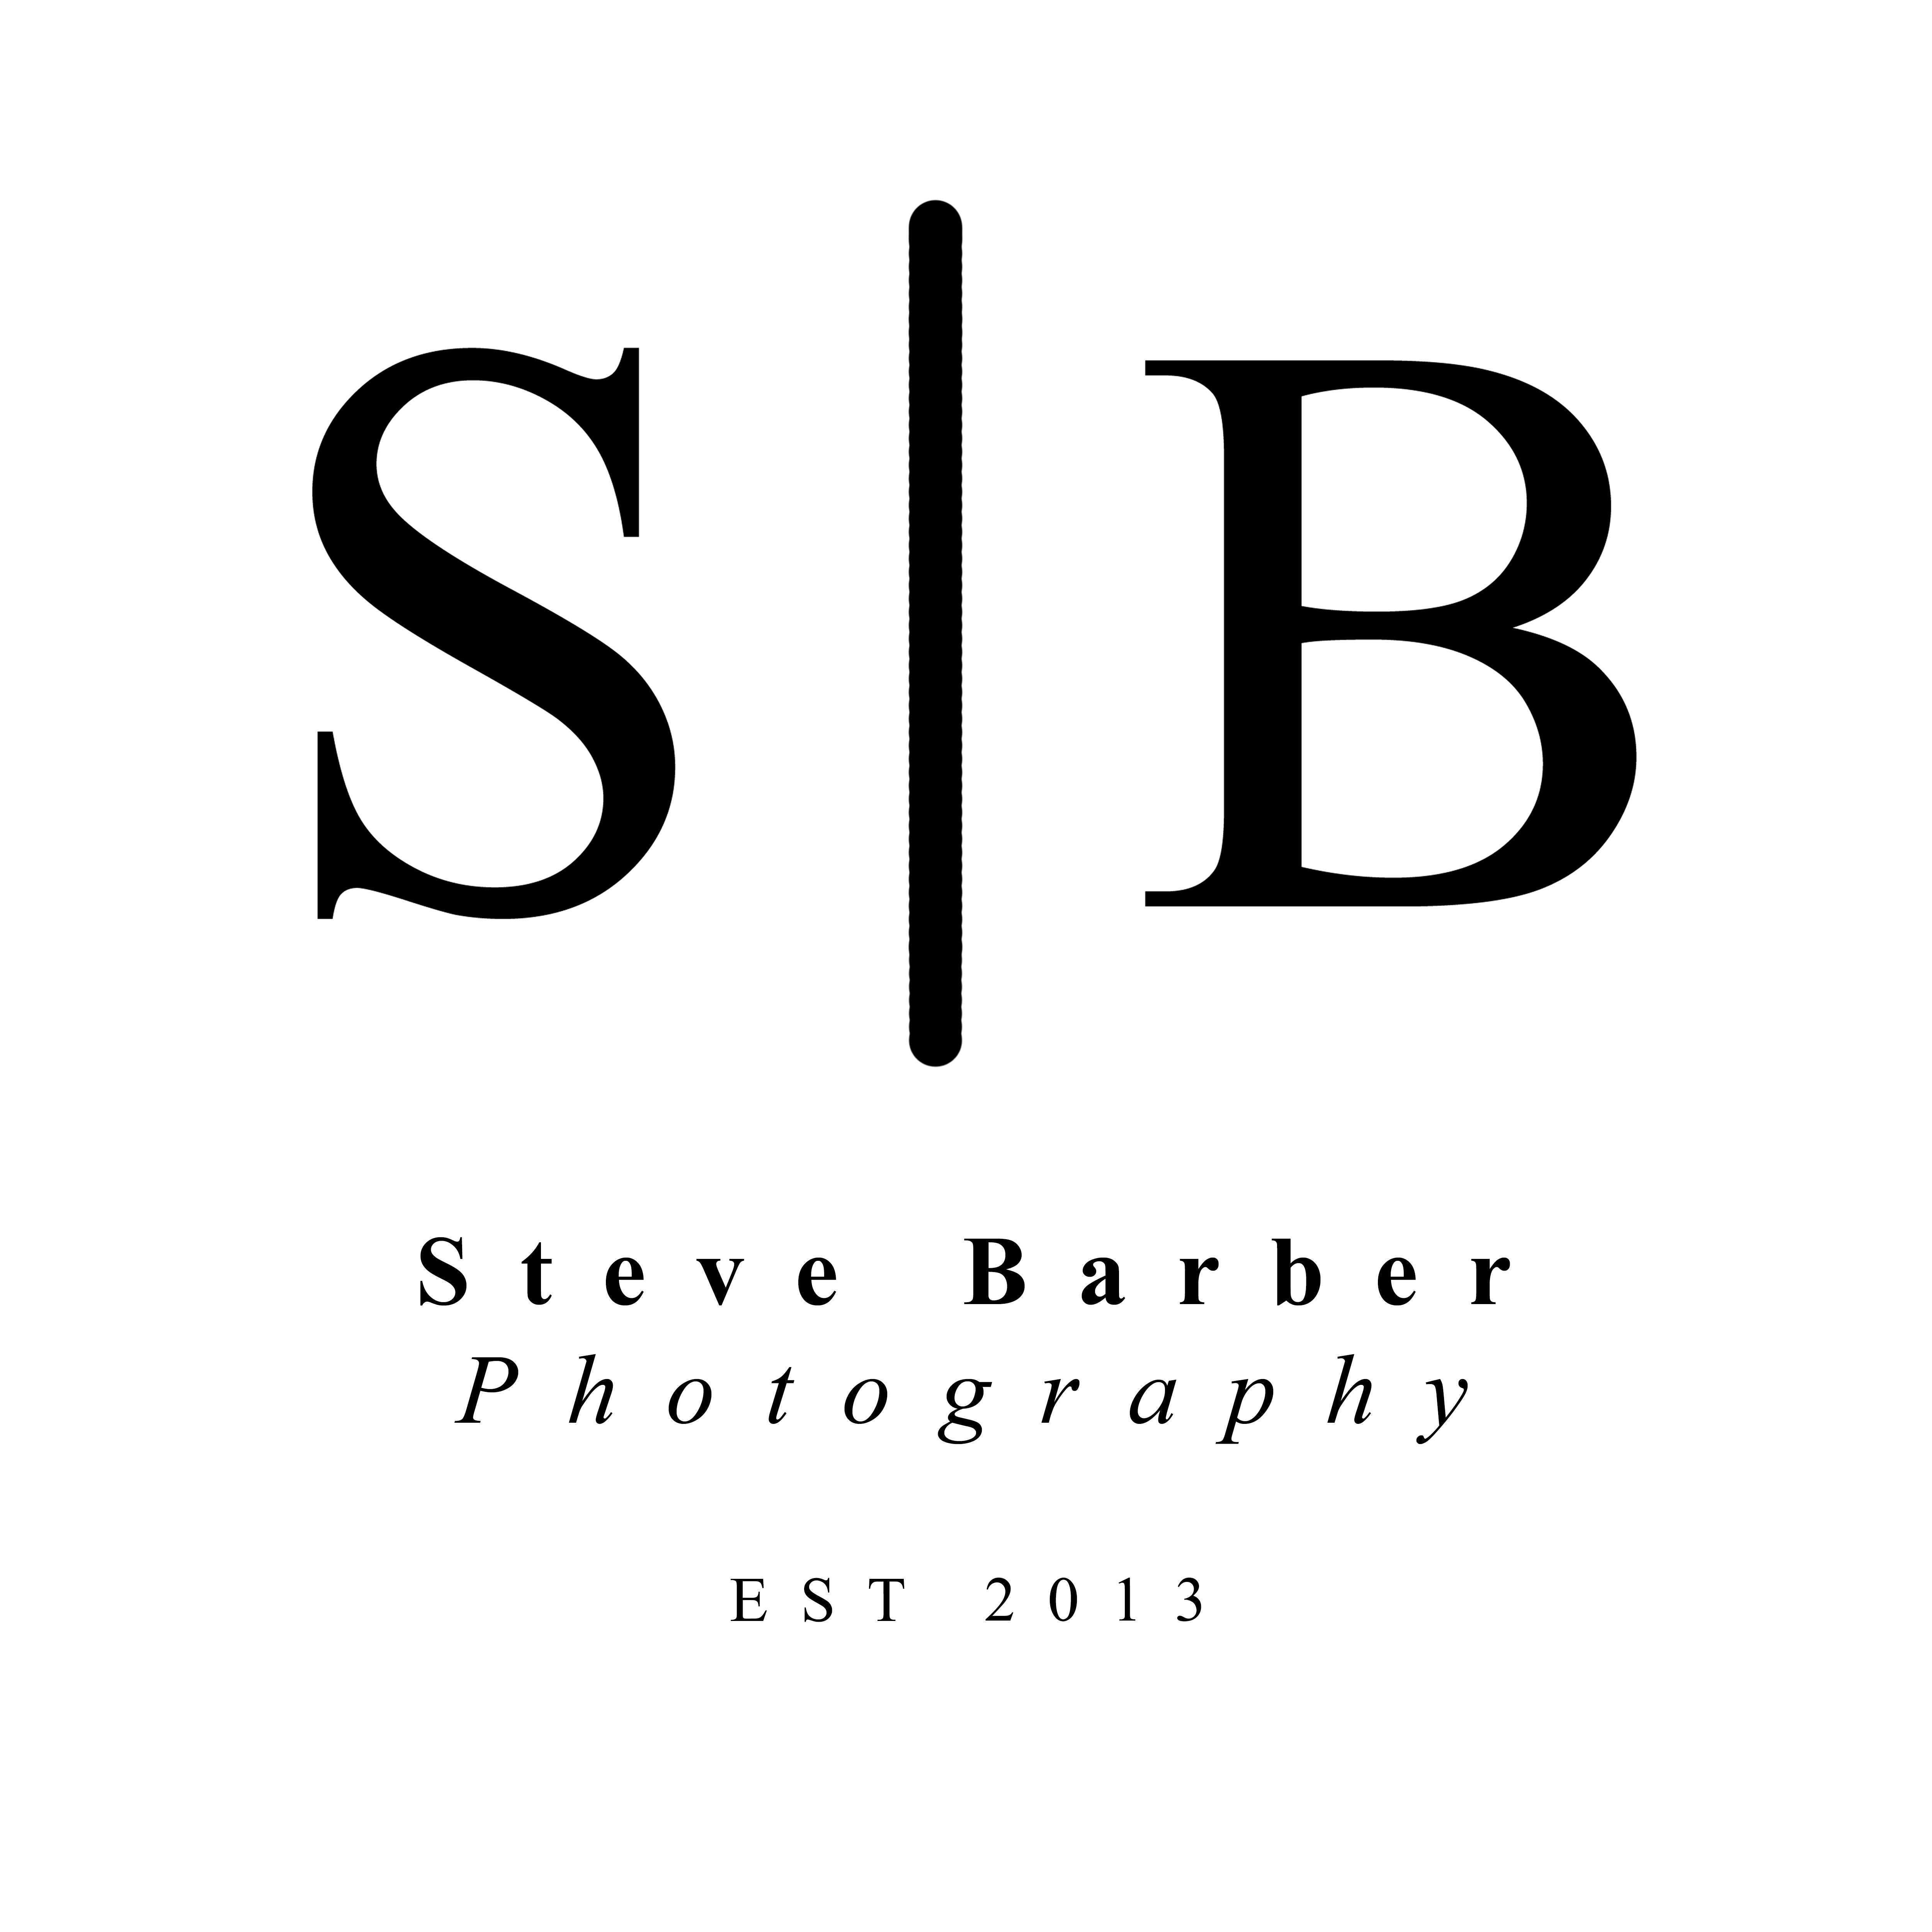 Steve Barber Photography